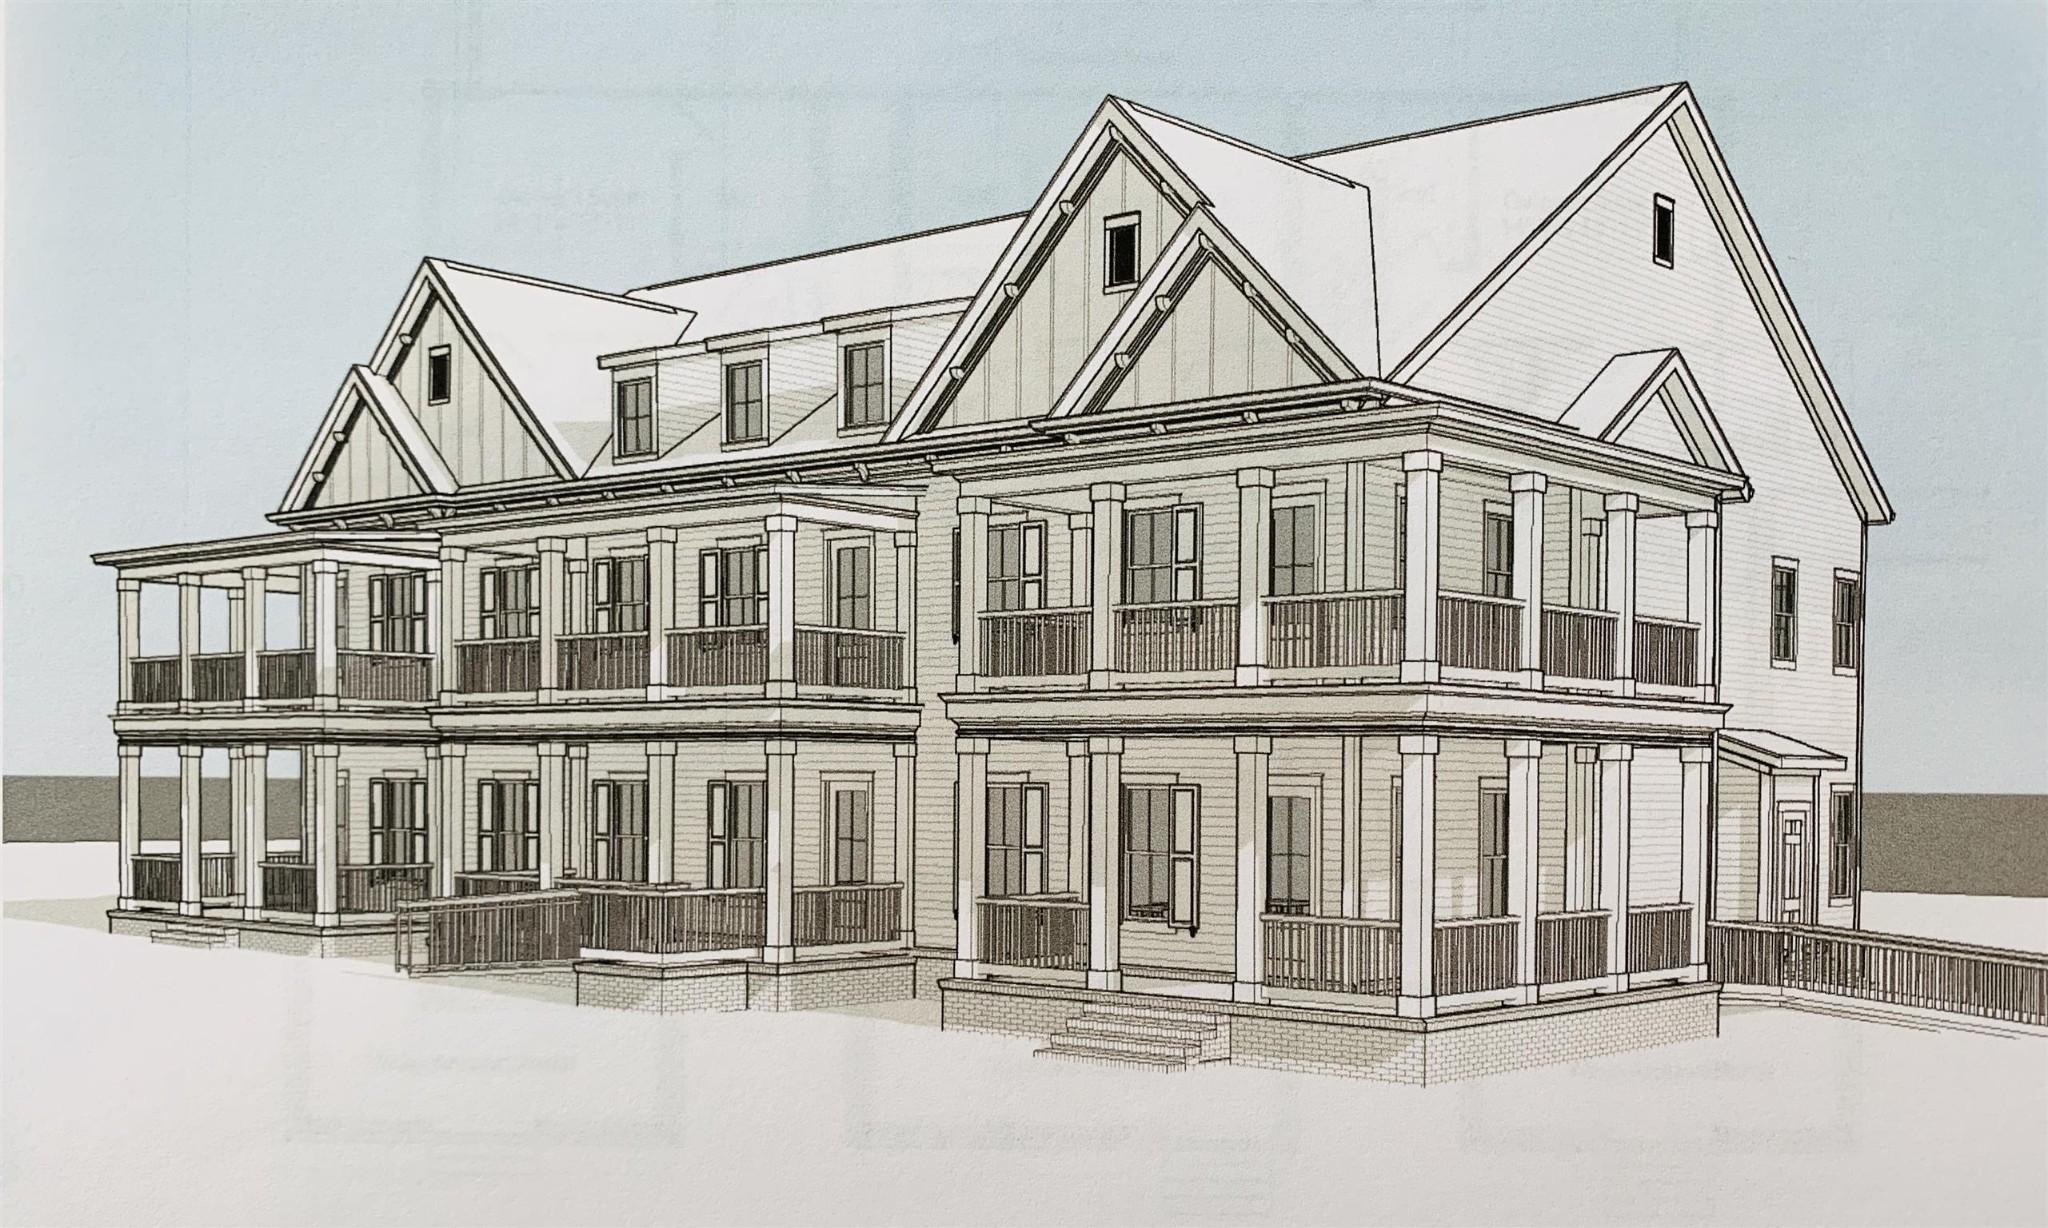 2333 Fairchild Circle #103, Nolensville, TN 37135 - Nolensville, TN real estate listing